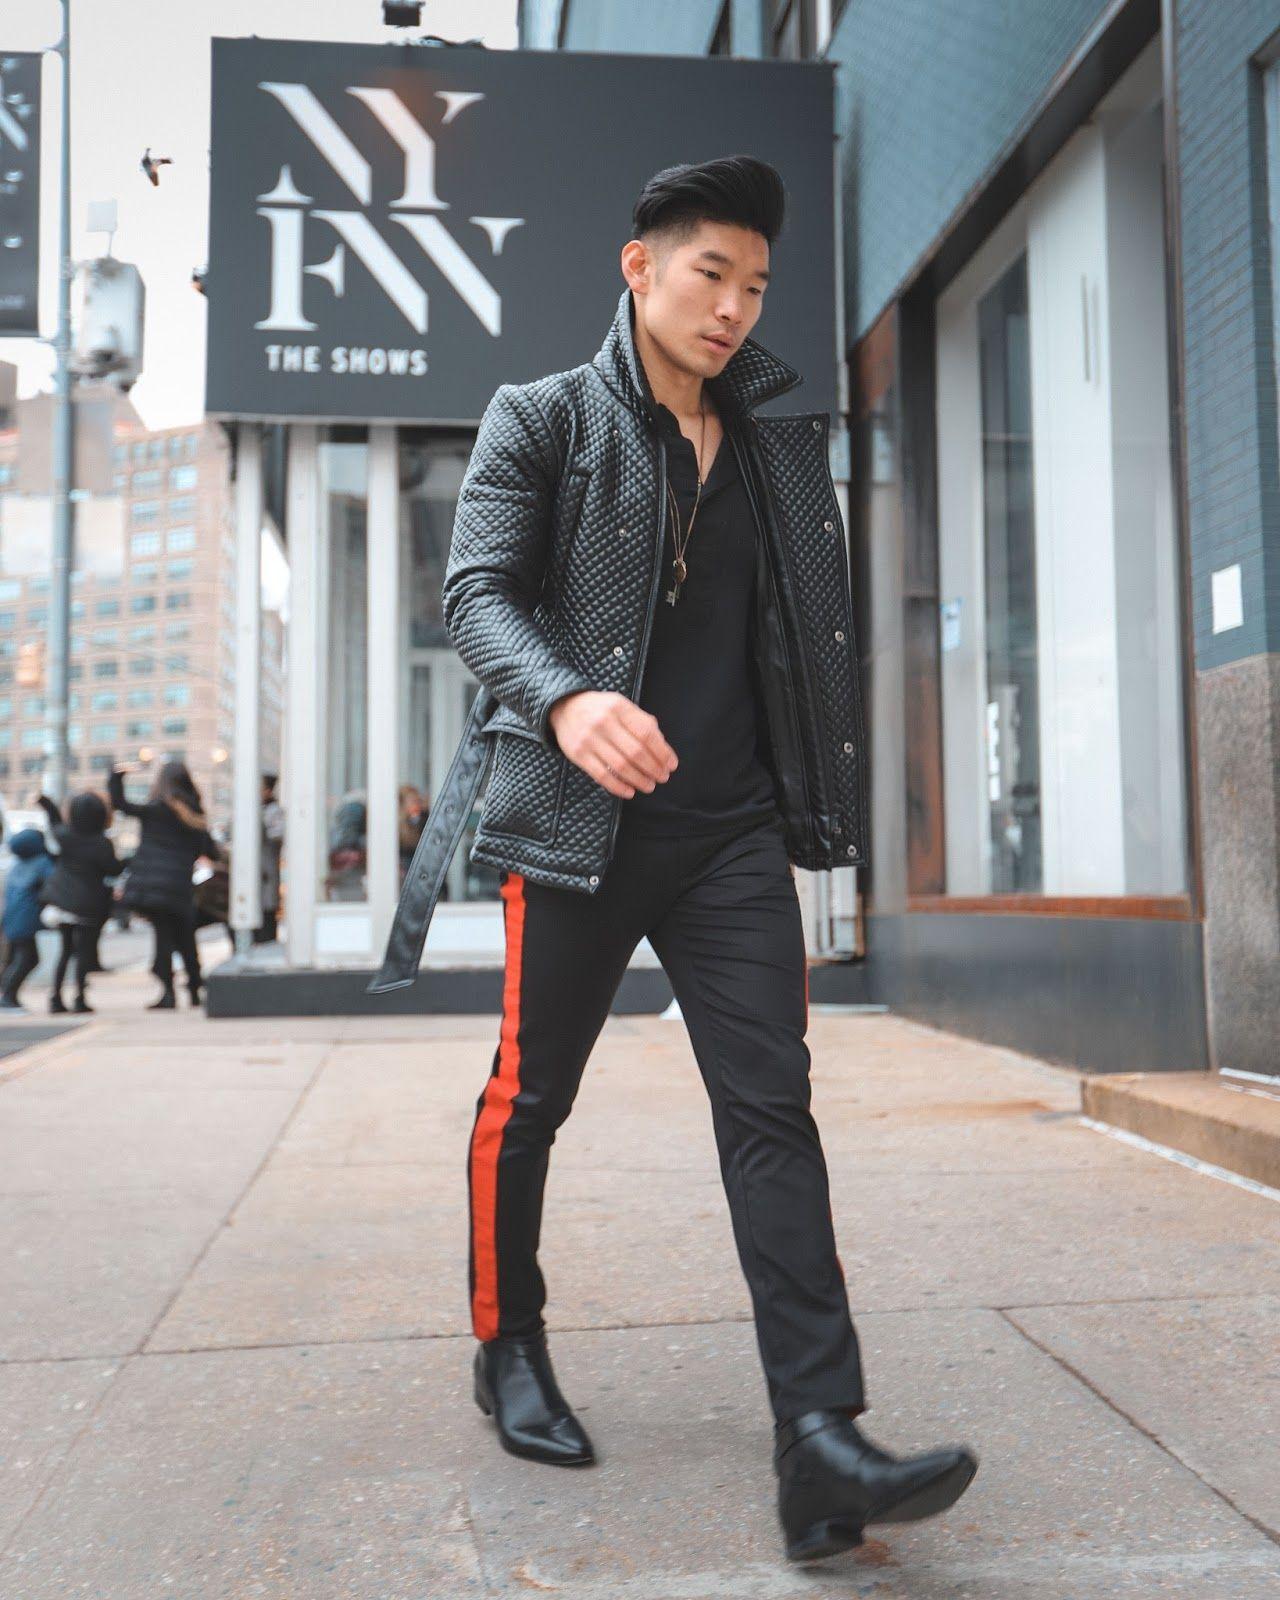 8e52334a9bf New York Fashion Week Men s Outfit - Leo Chan